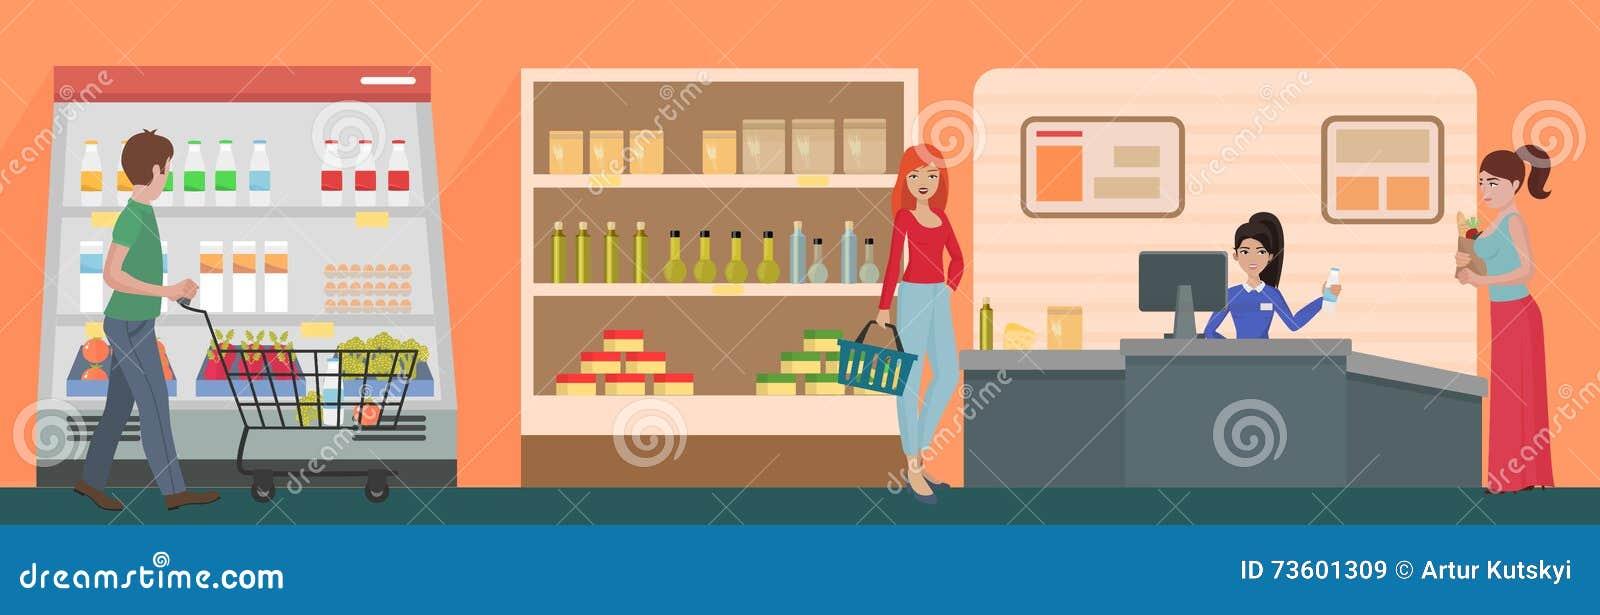 Cashier Cartoons: Cartoon Cashier Employee Stock Illustrations